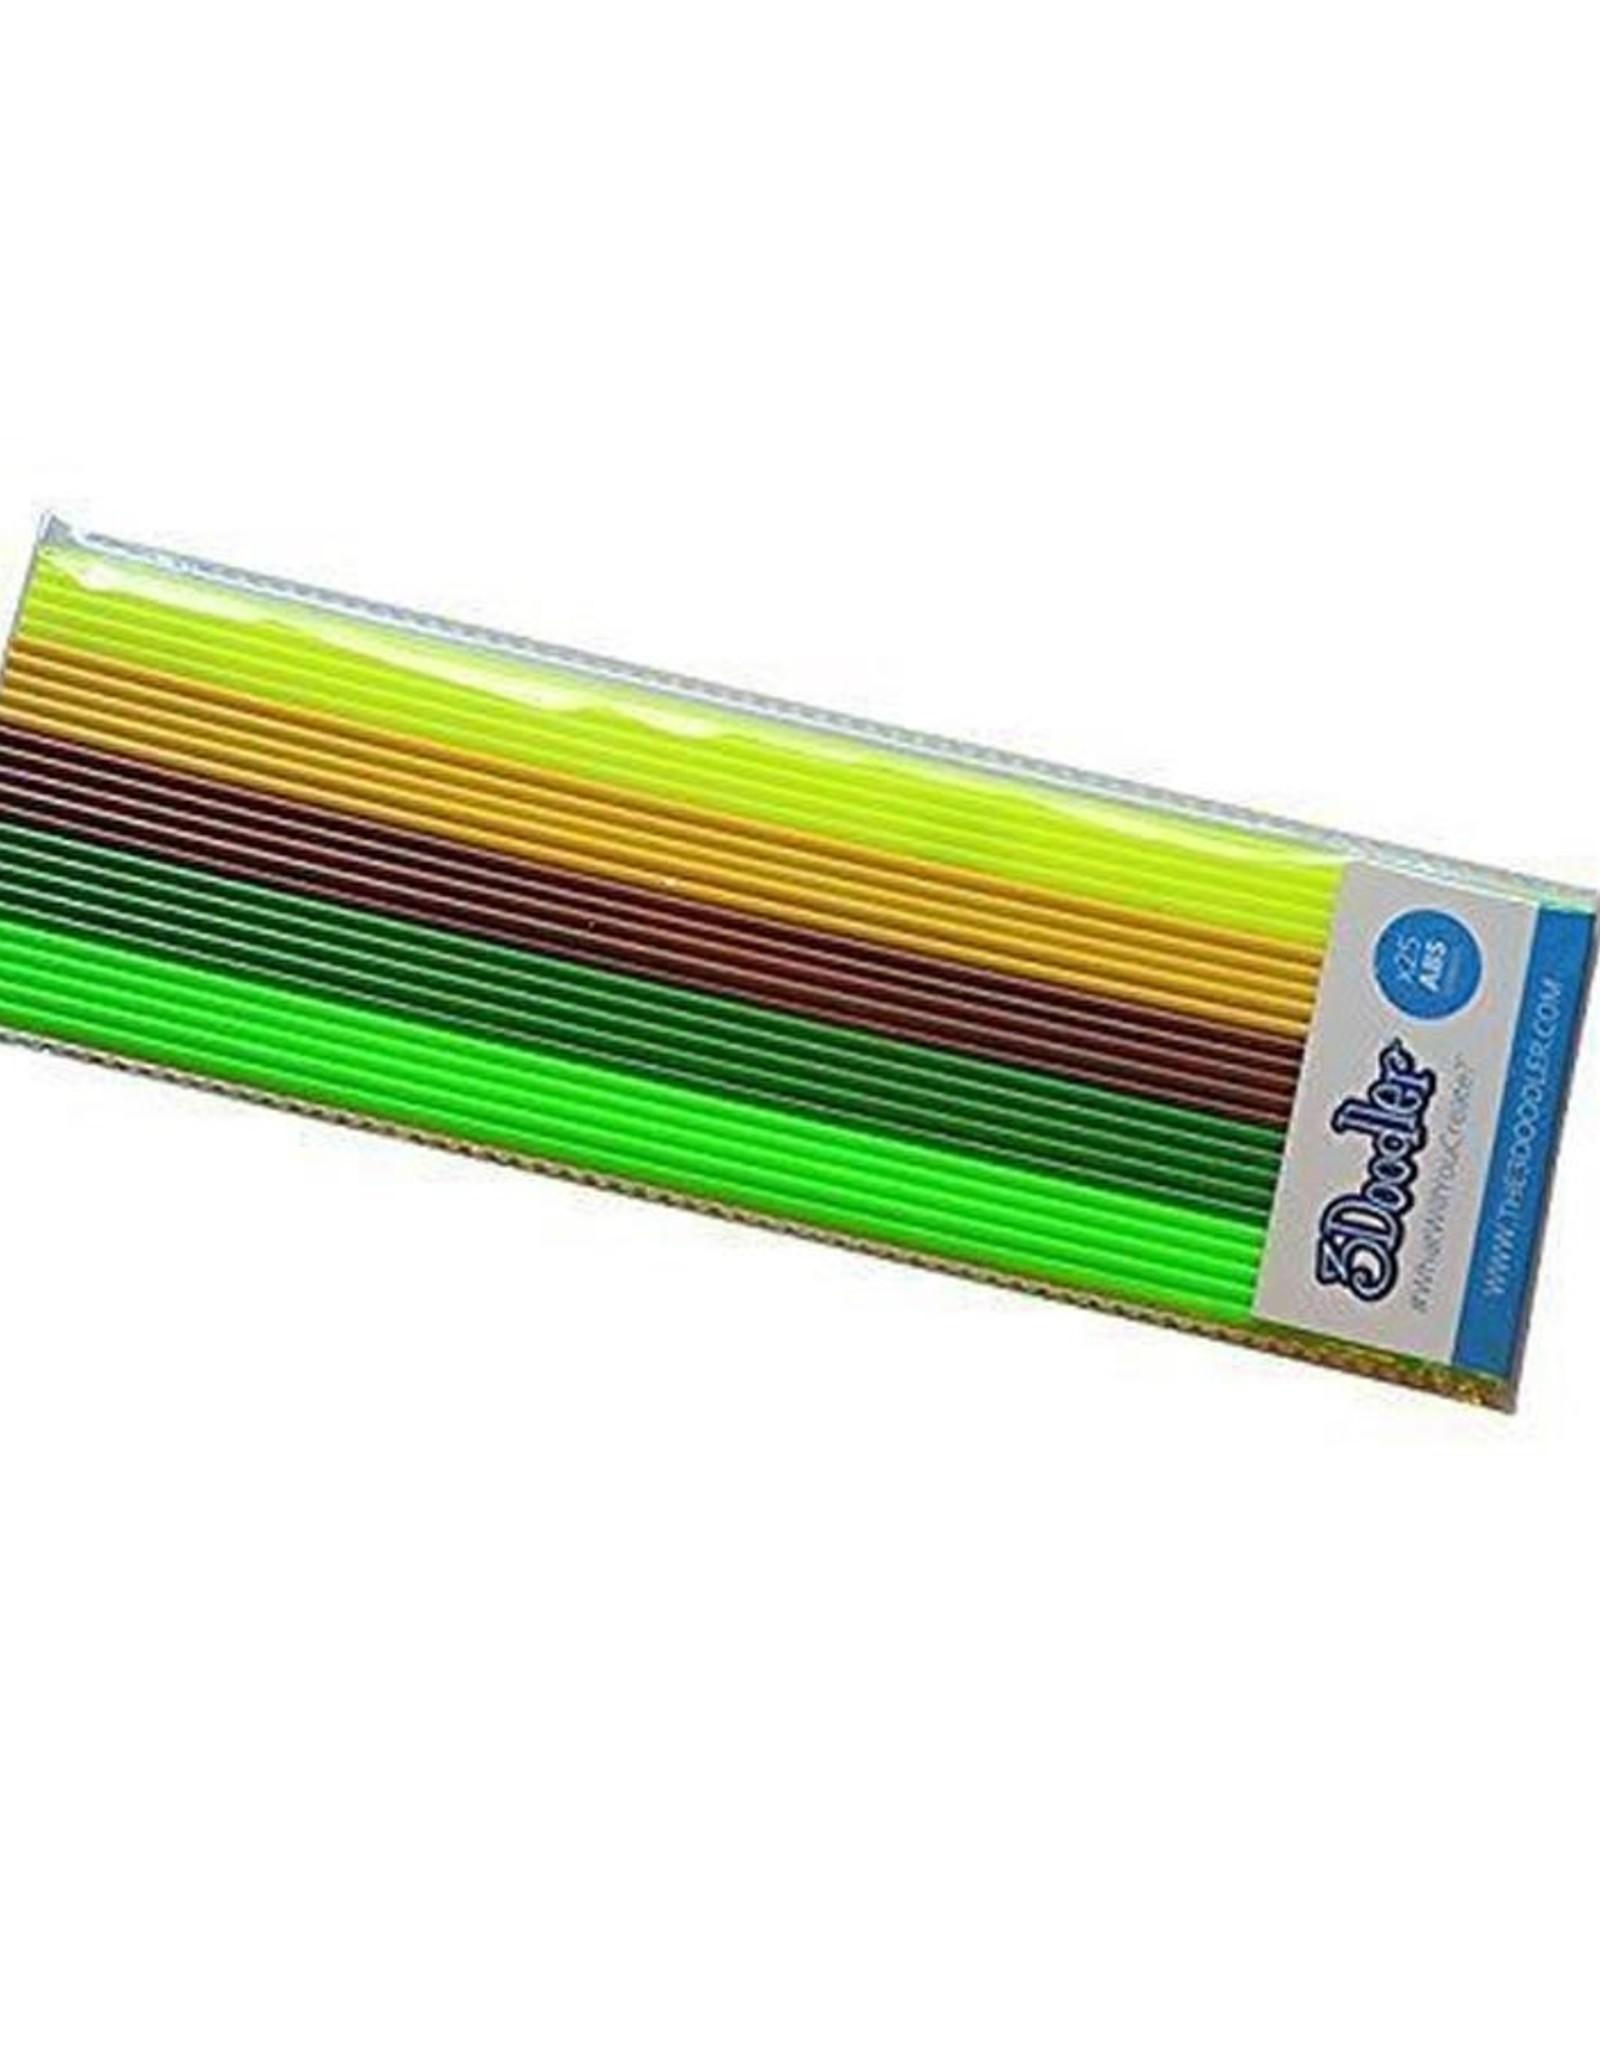 3Doodler ABS Plastic 25pc - Jungle (Grn,Grn,Brwn,Yel,Yel)